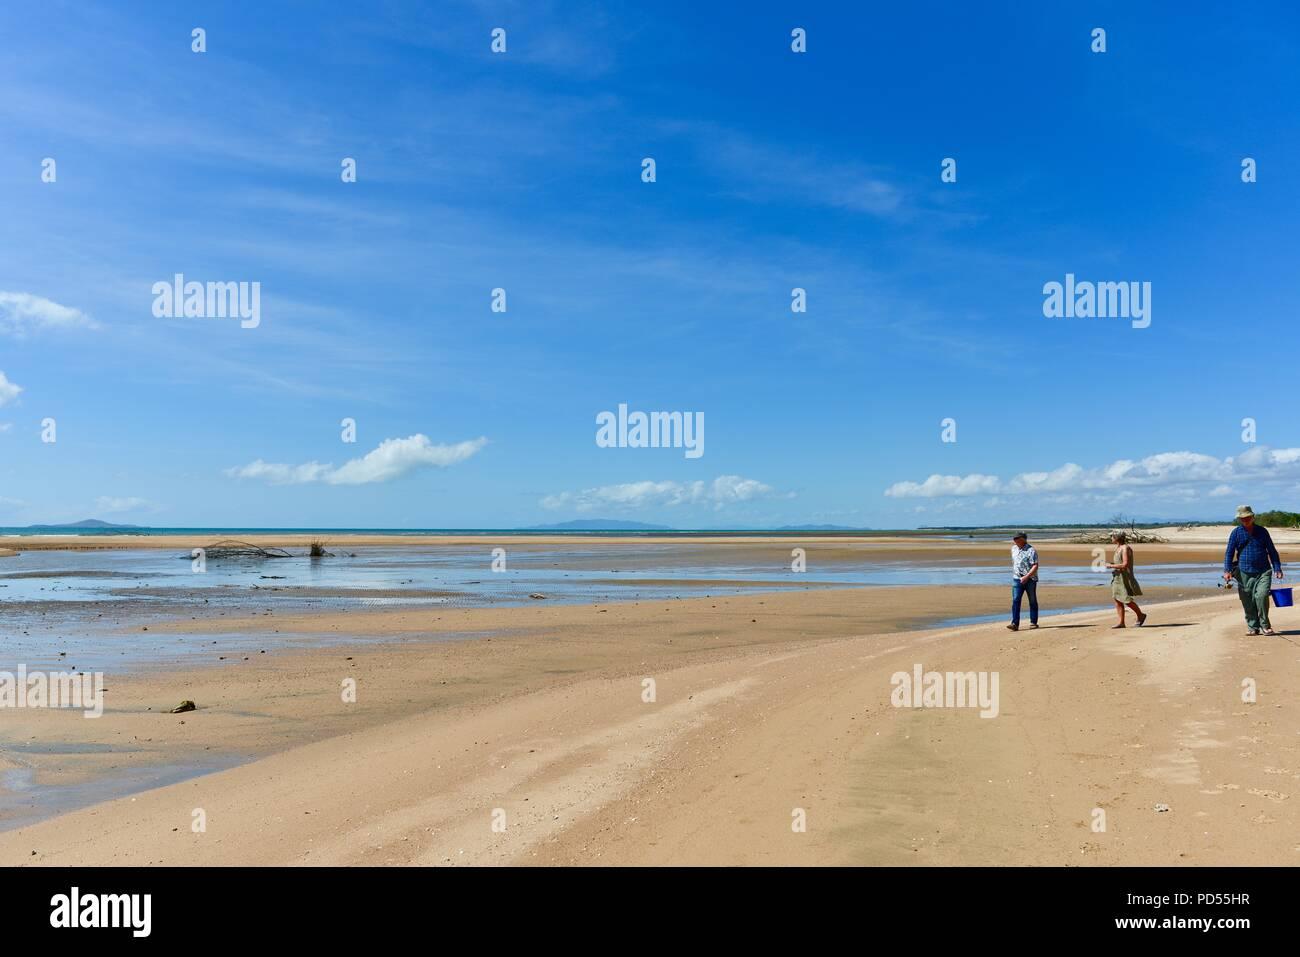 People on a beach, Toomulla QLD, Australia - Stock Image